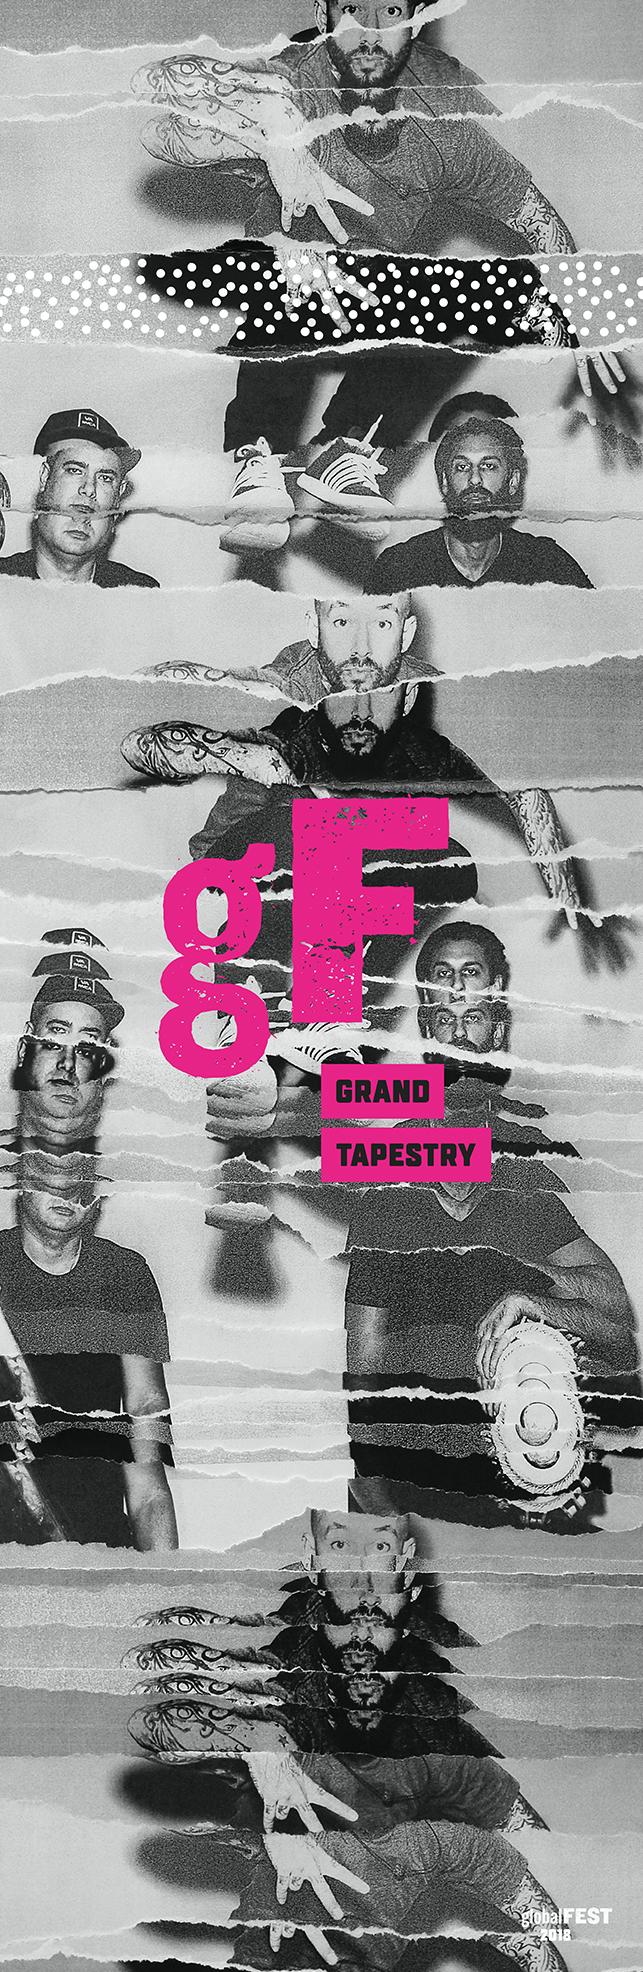 diogomontes_globalfest_artist_posters-grandtapestry